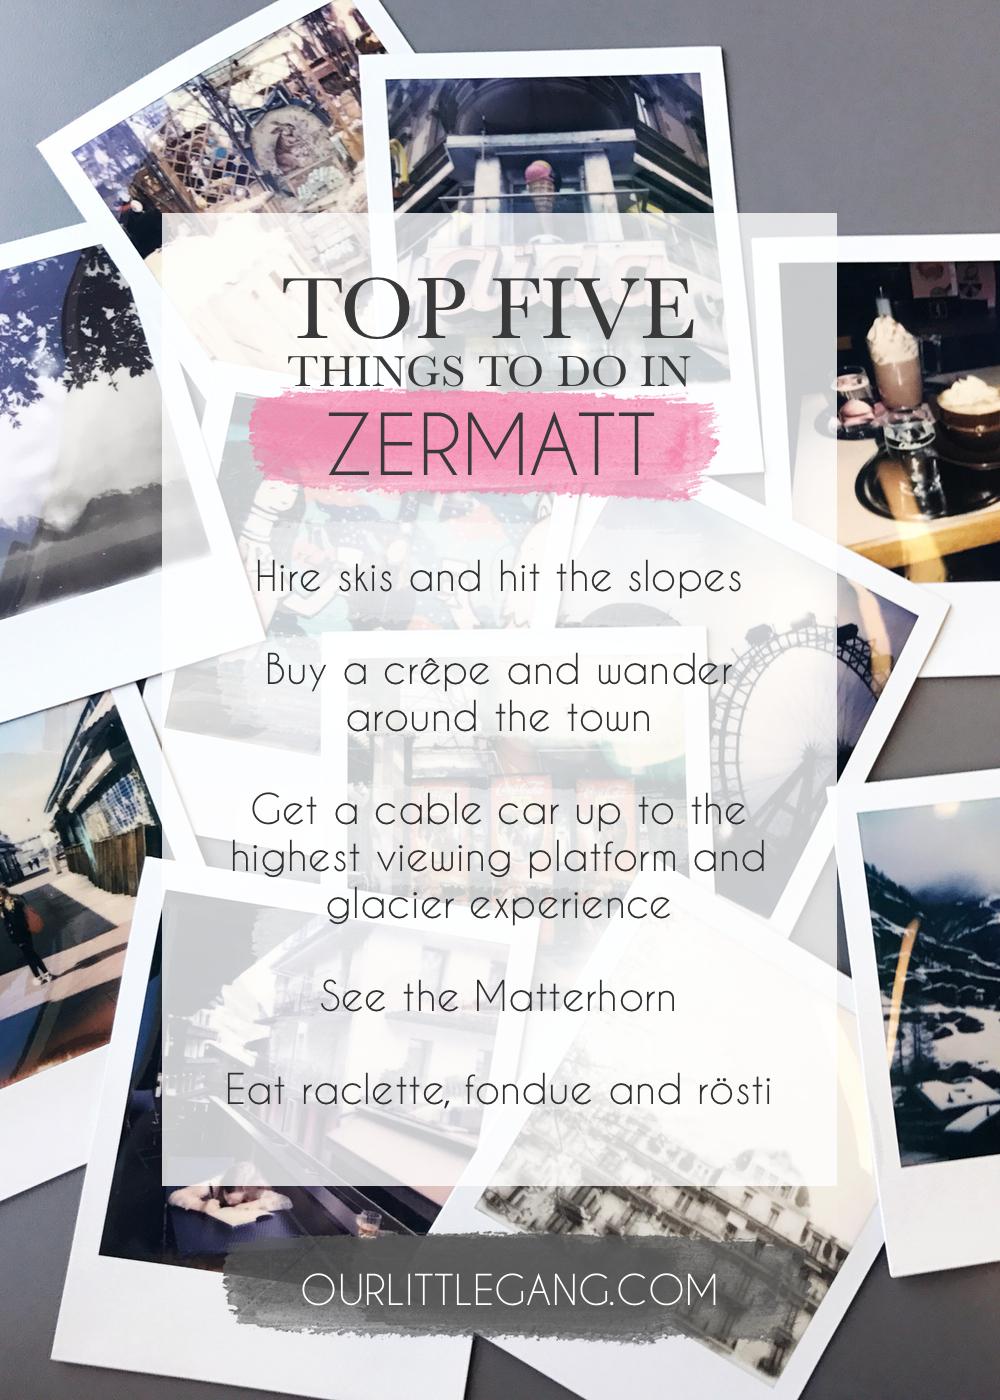 top-five-things-to-do-in-zermatt-switzerland.jpg